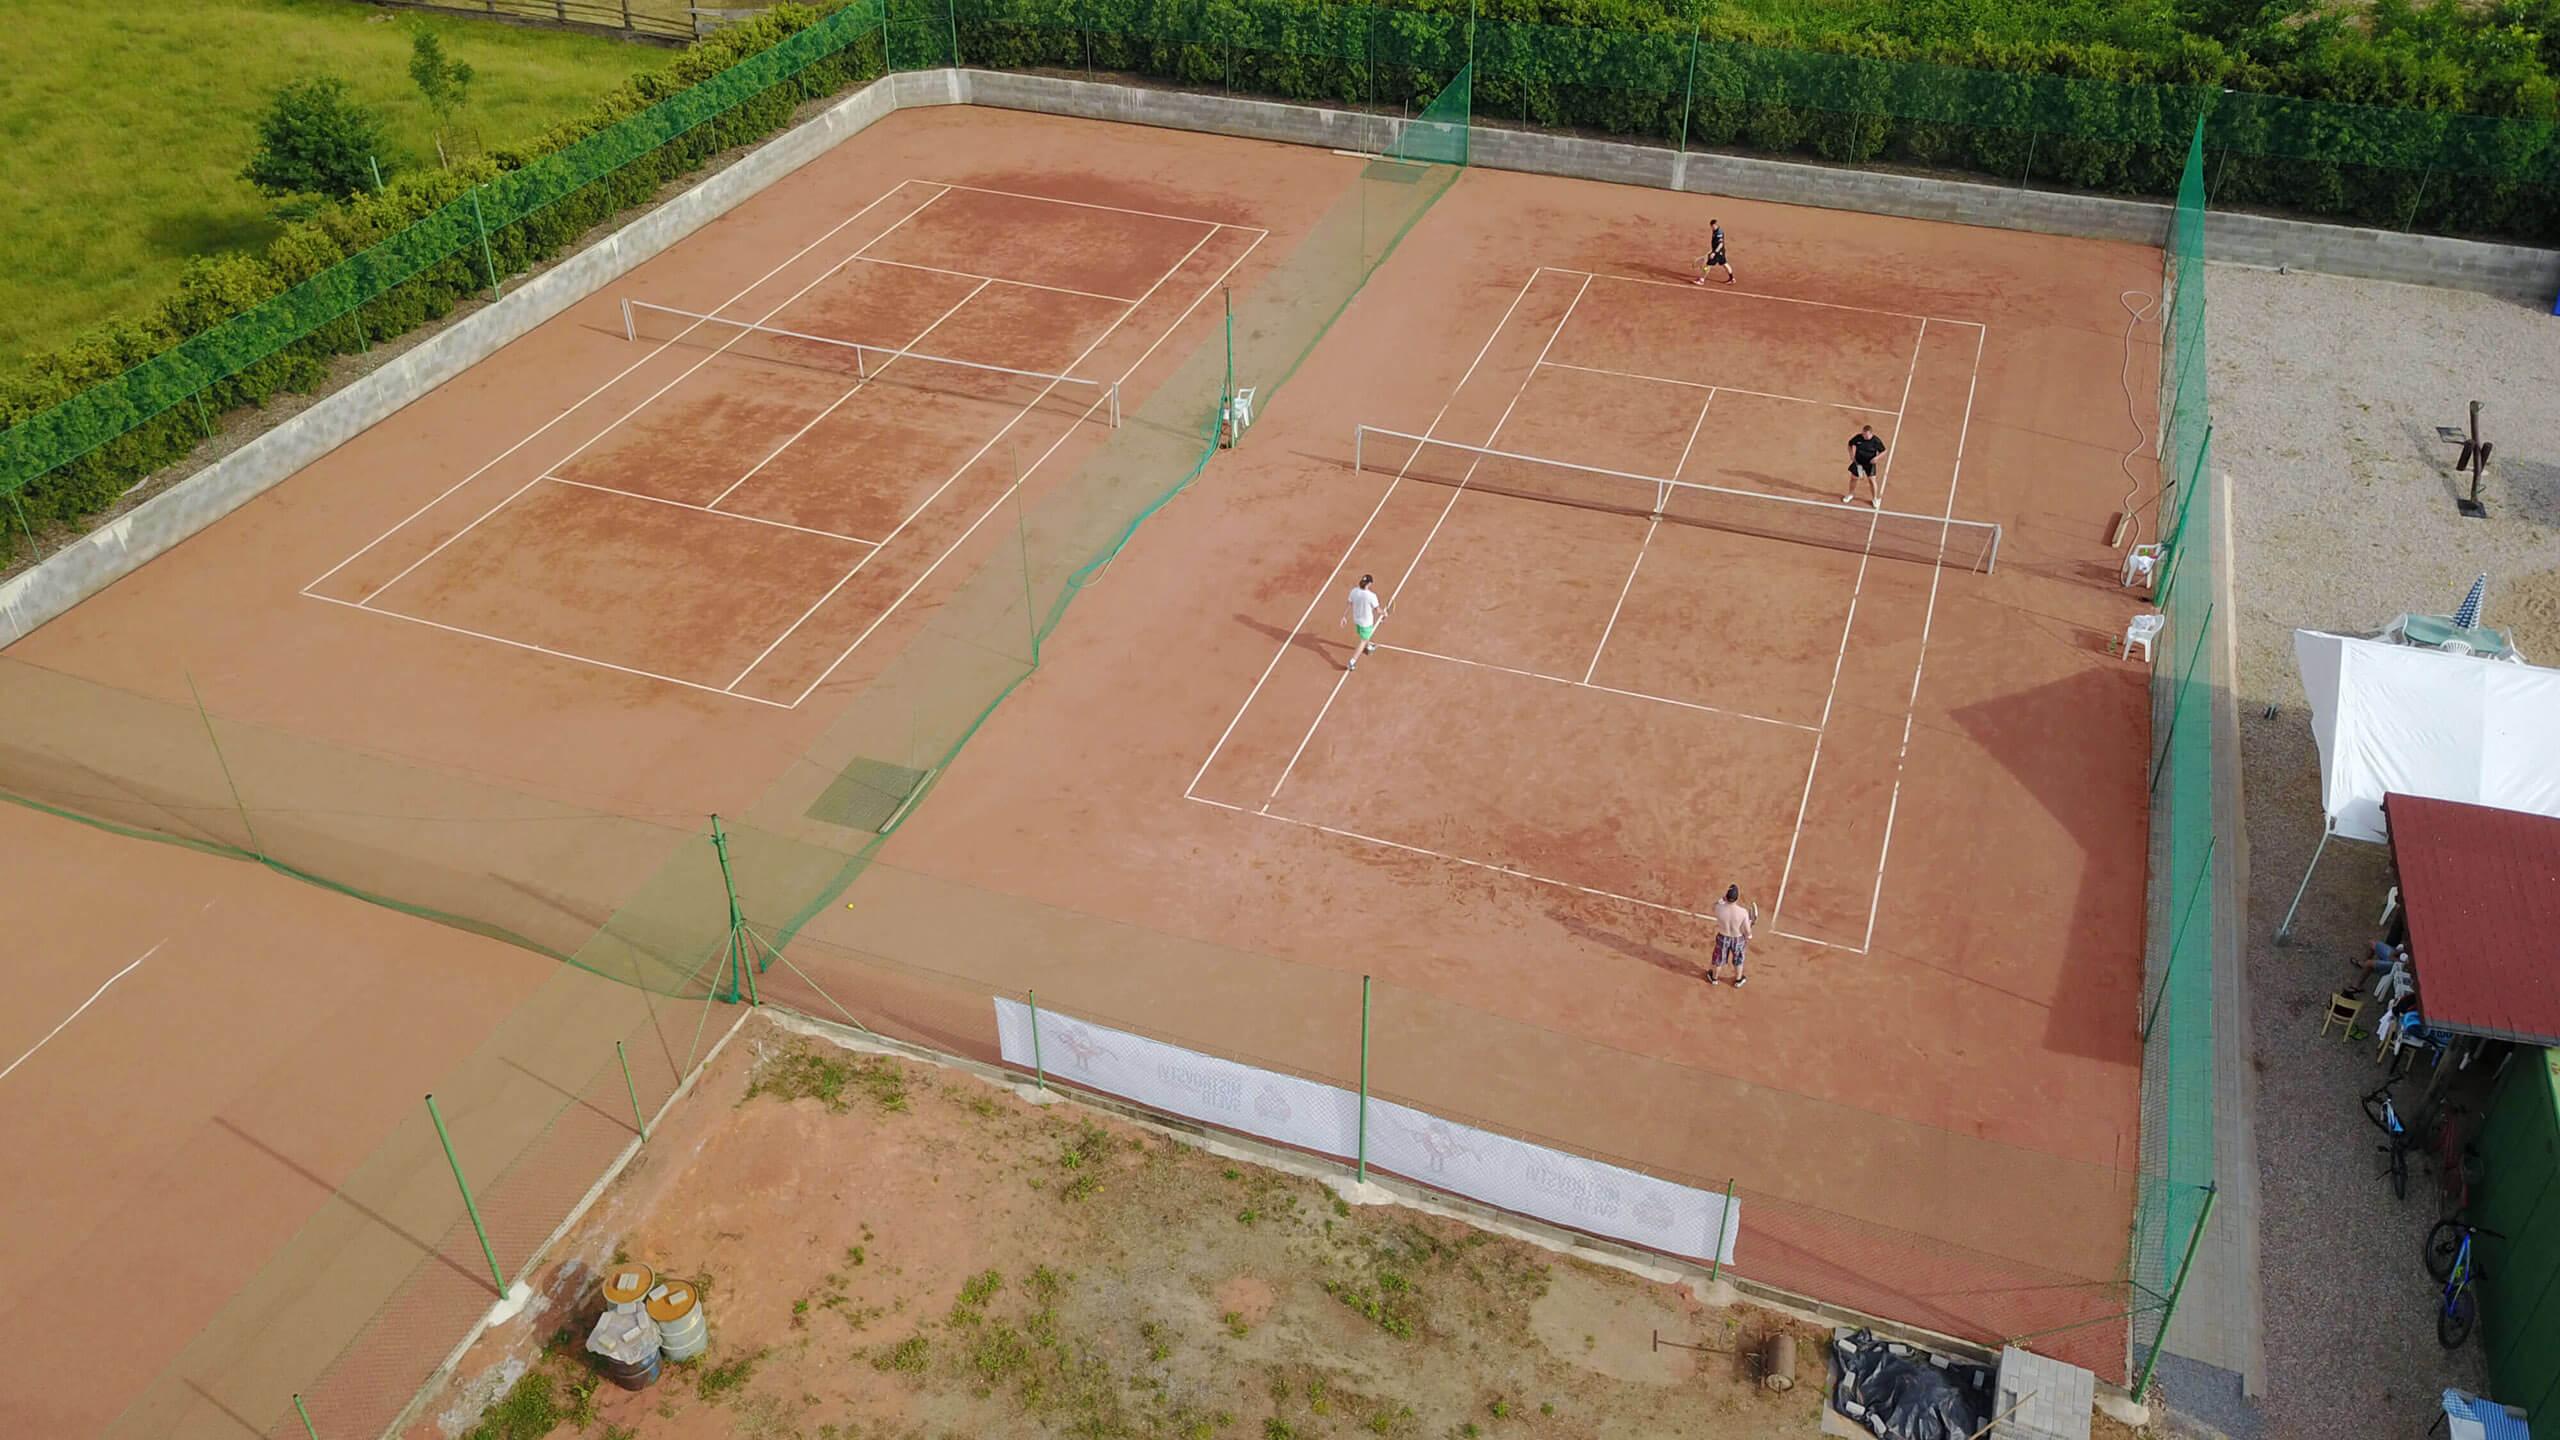 Tenis a plážový volejbal Pardubice